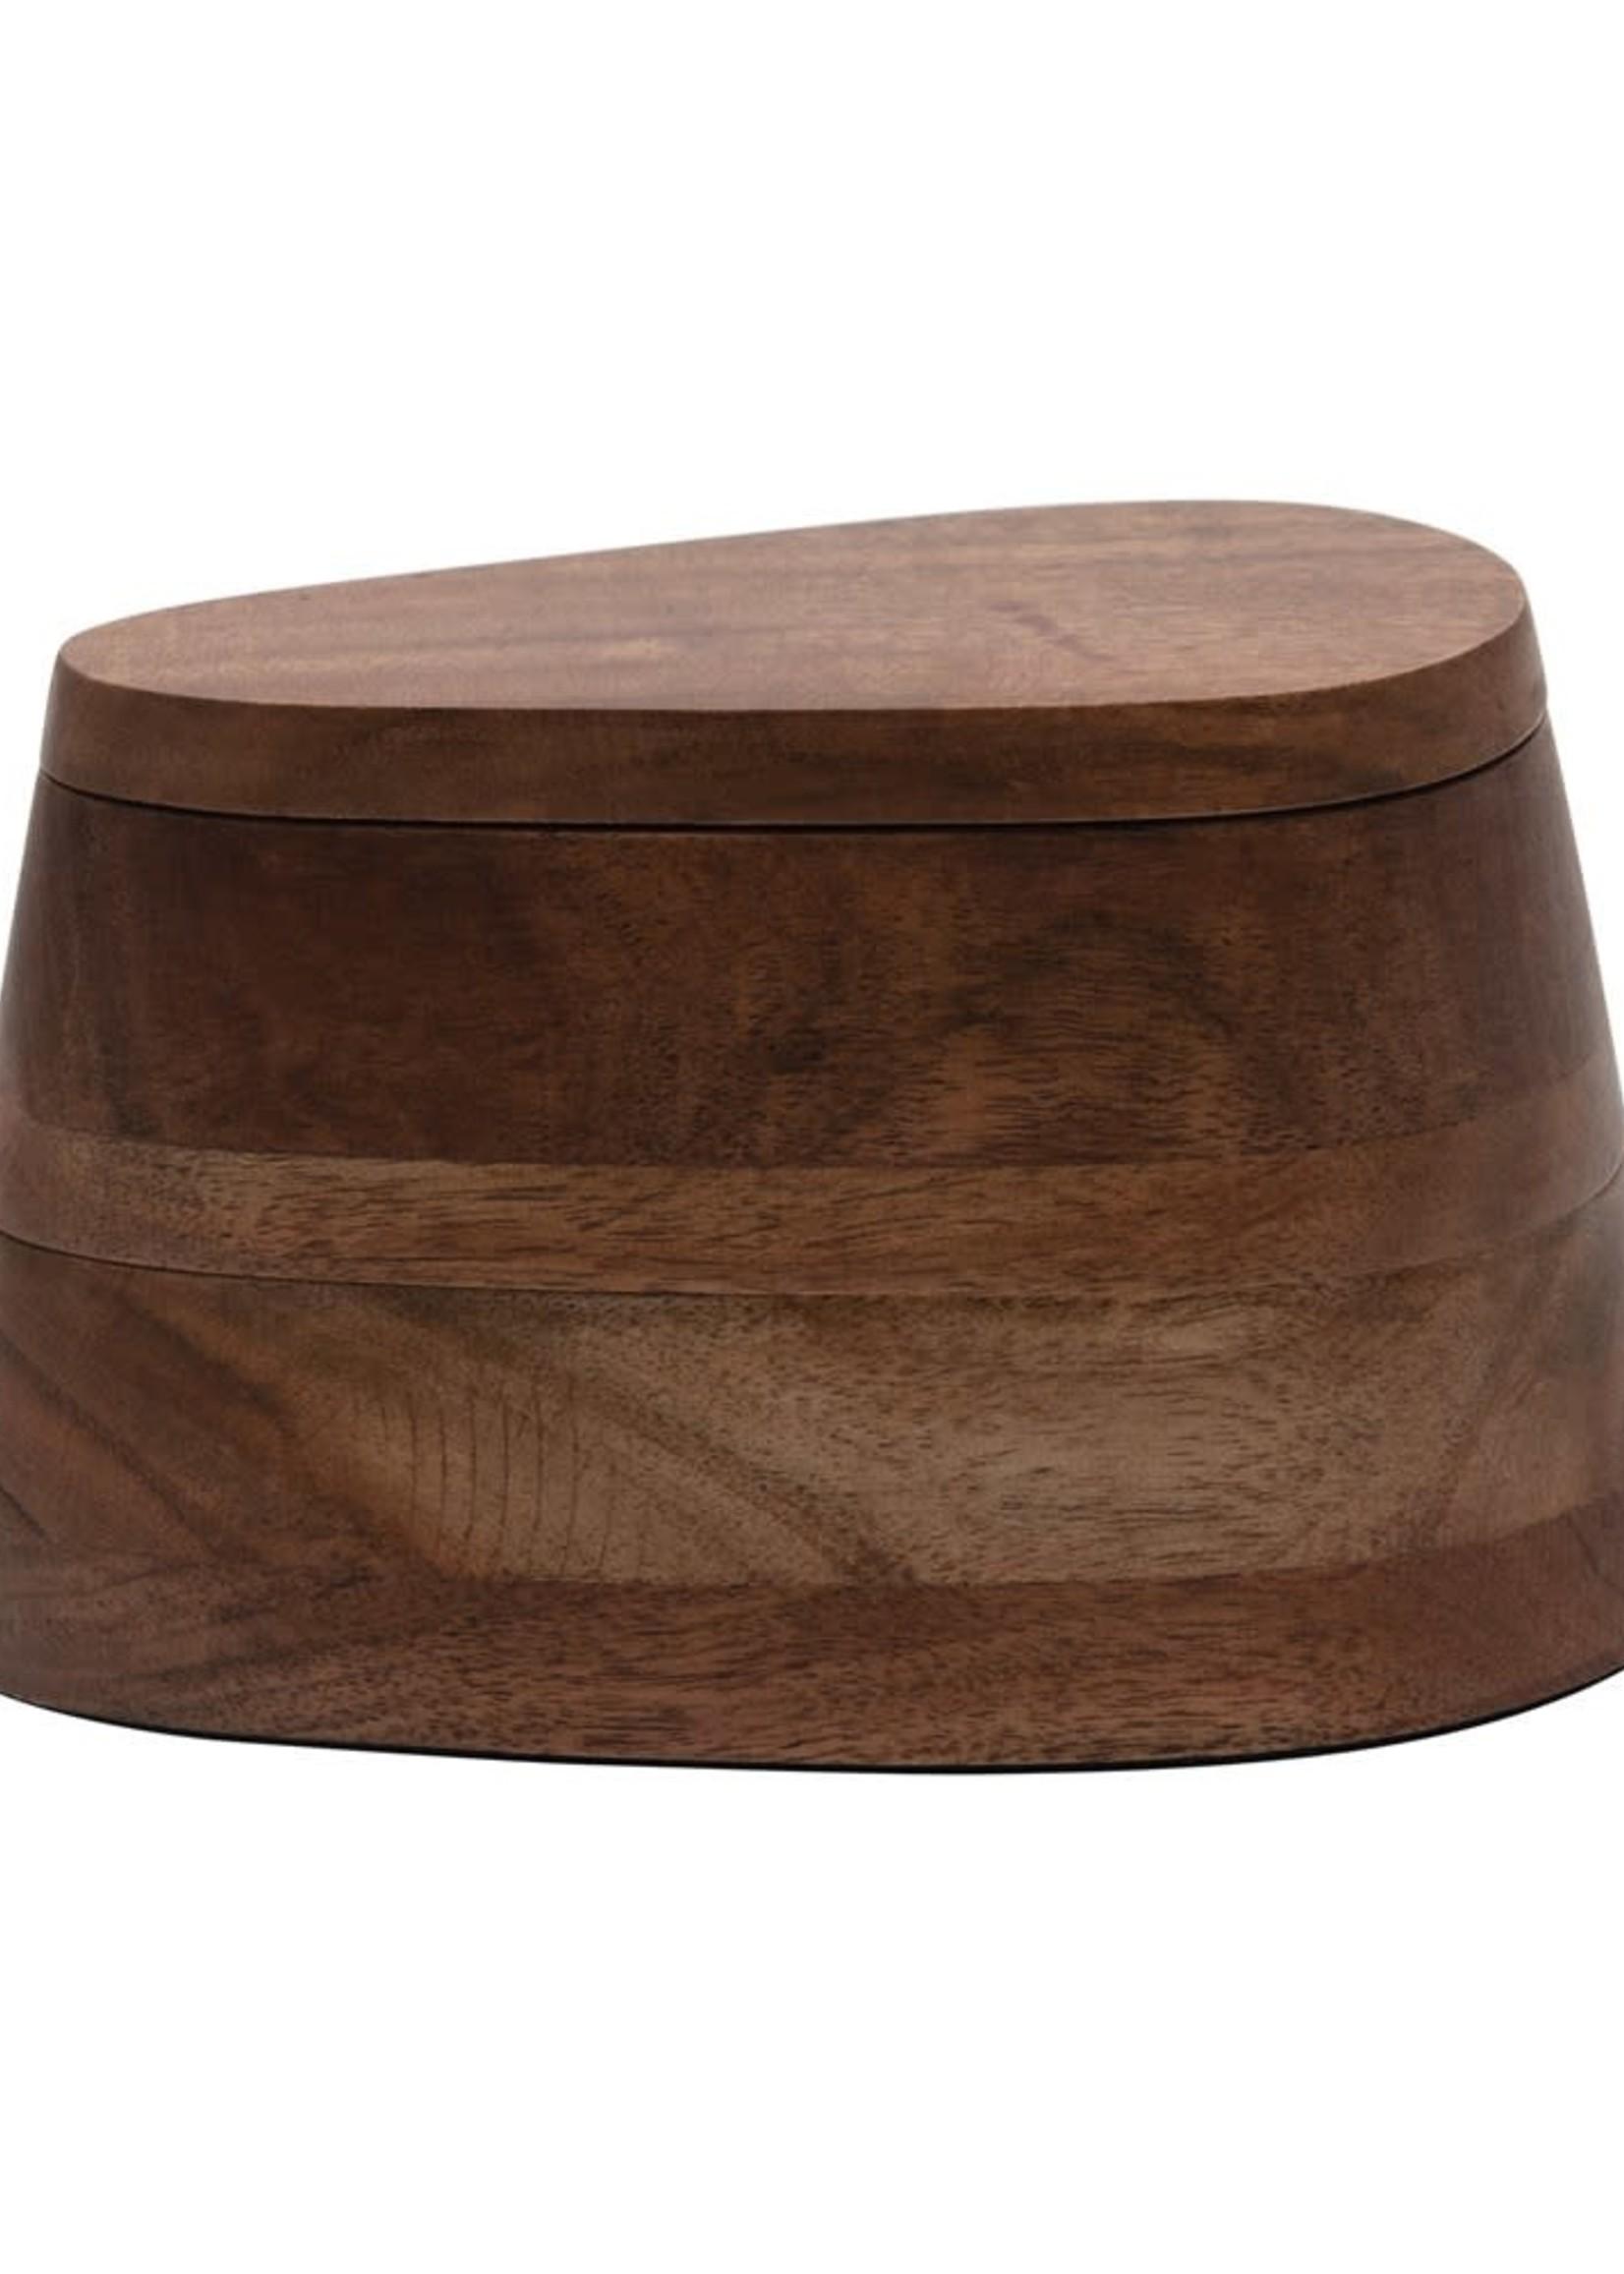 Acacia Wood 2-Tier Salt & Pepper Dish w/ Lid